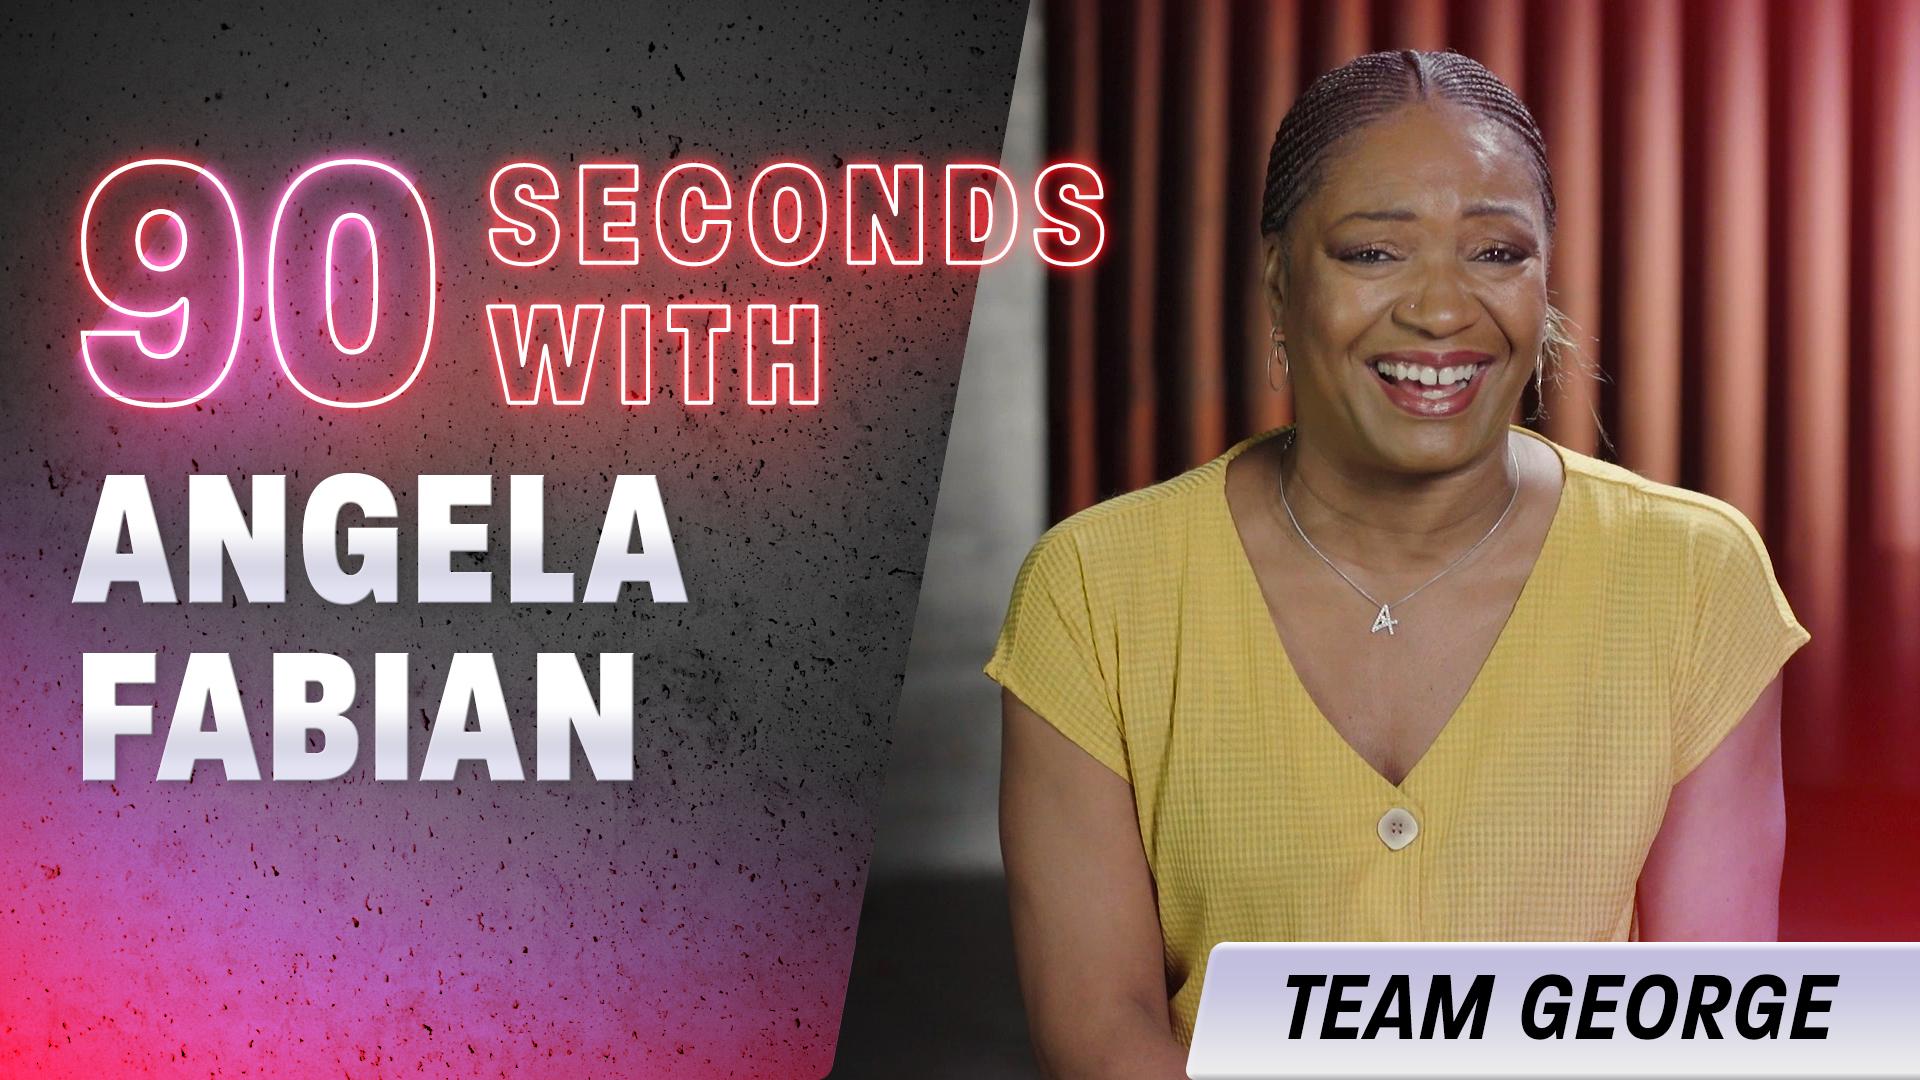 90 Seconds with Angela Fabian